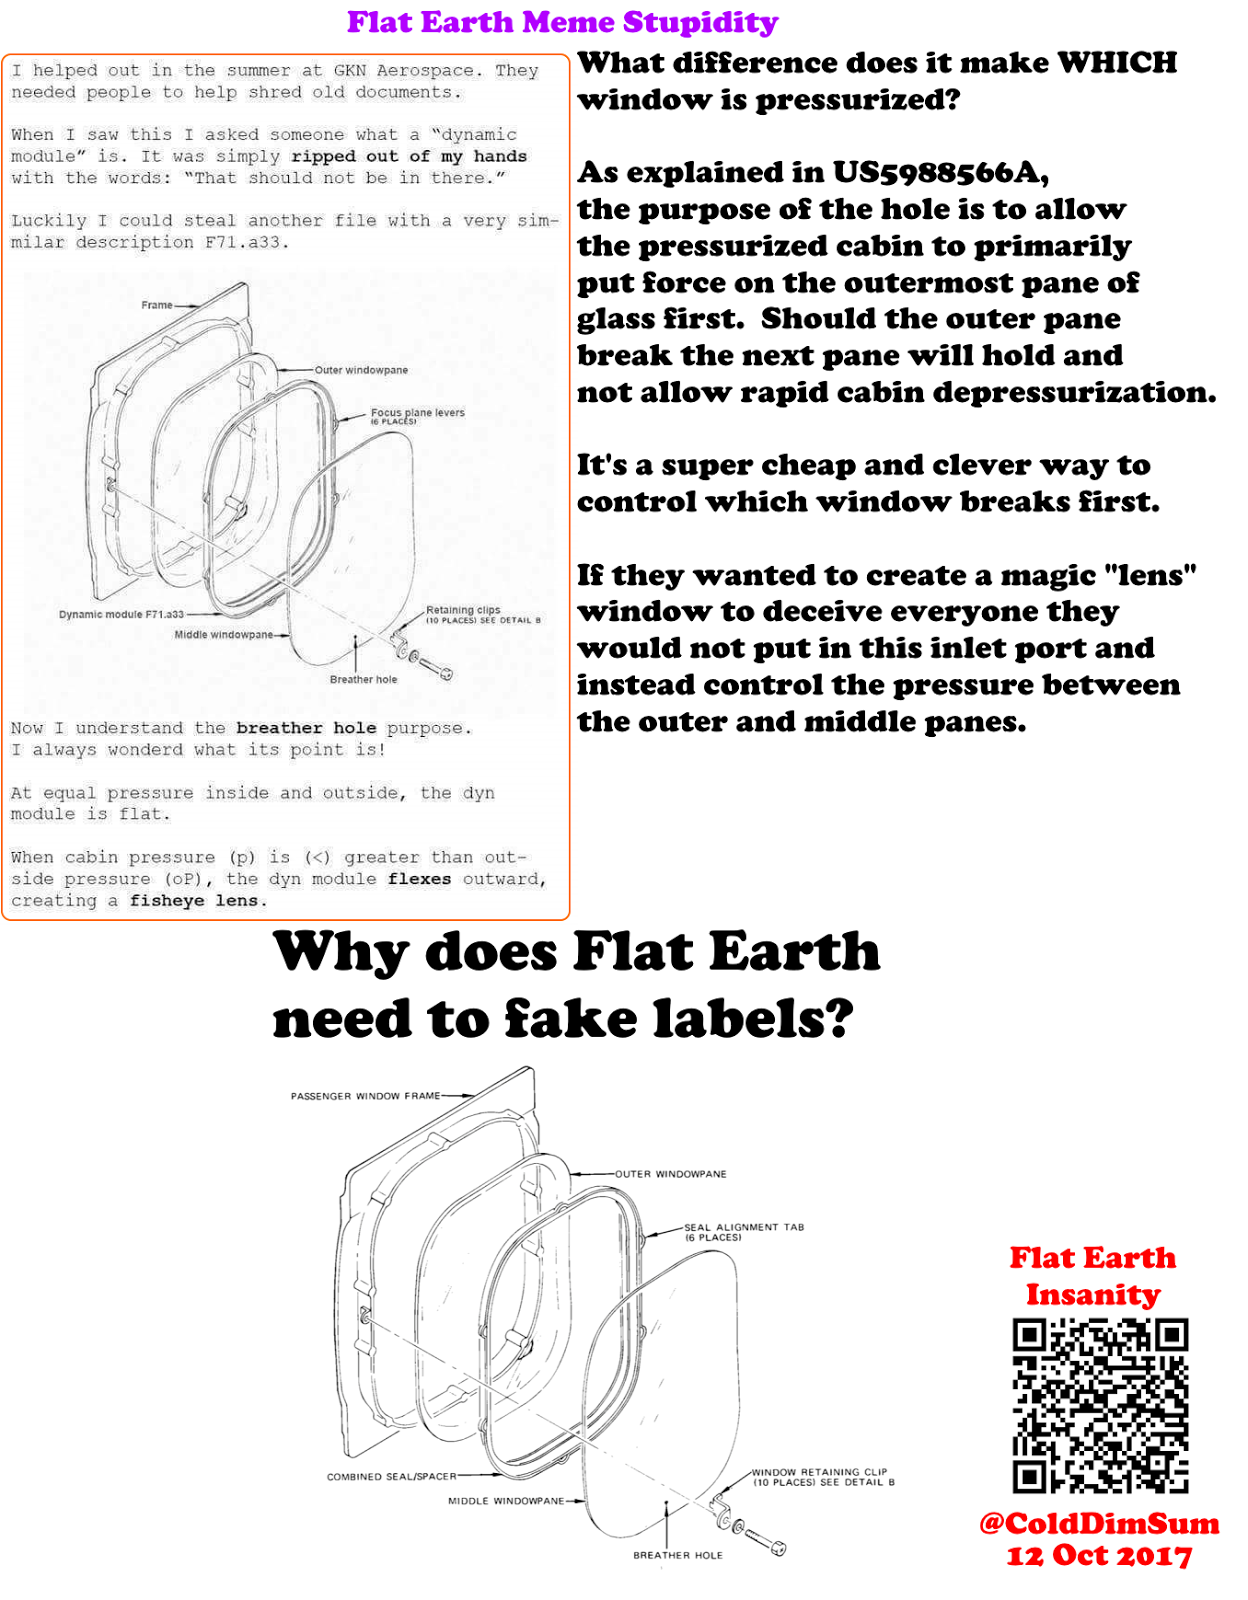 flat earth insanity  flat earth follies  magic fish